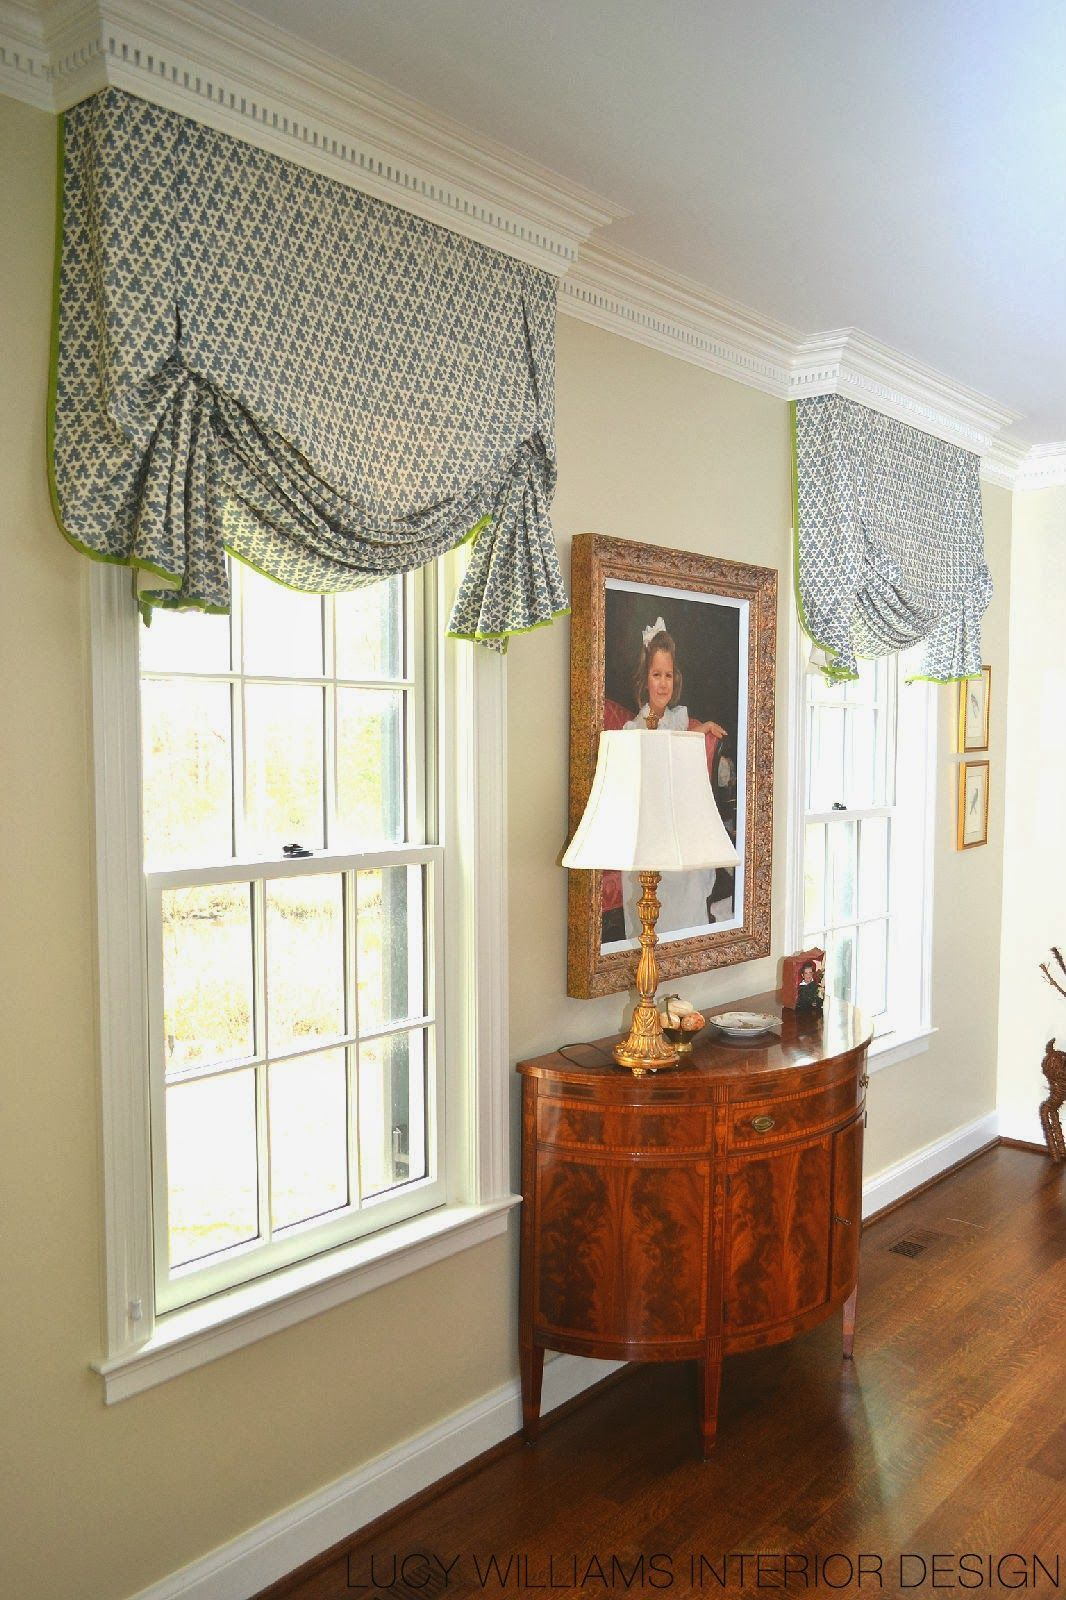 Window covering ideas   window treatment ideas and curtain designs photos  window